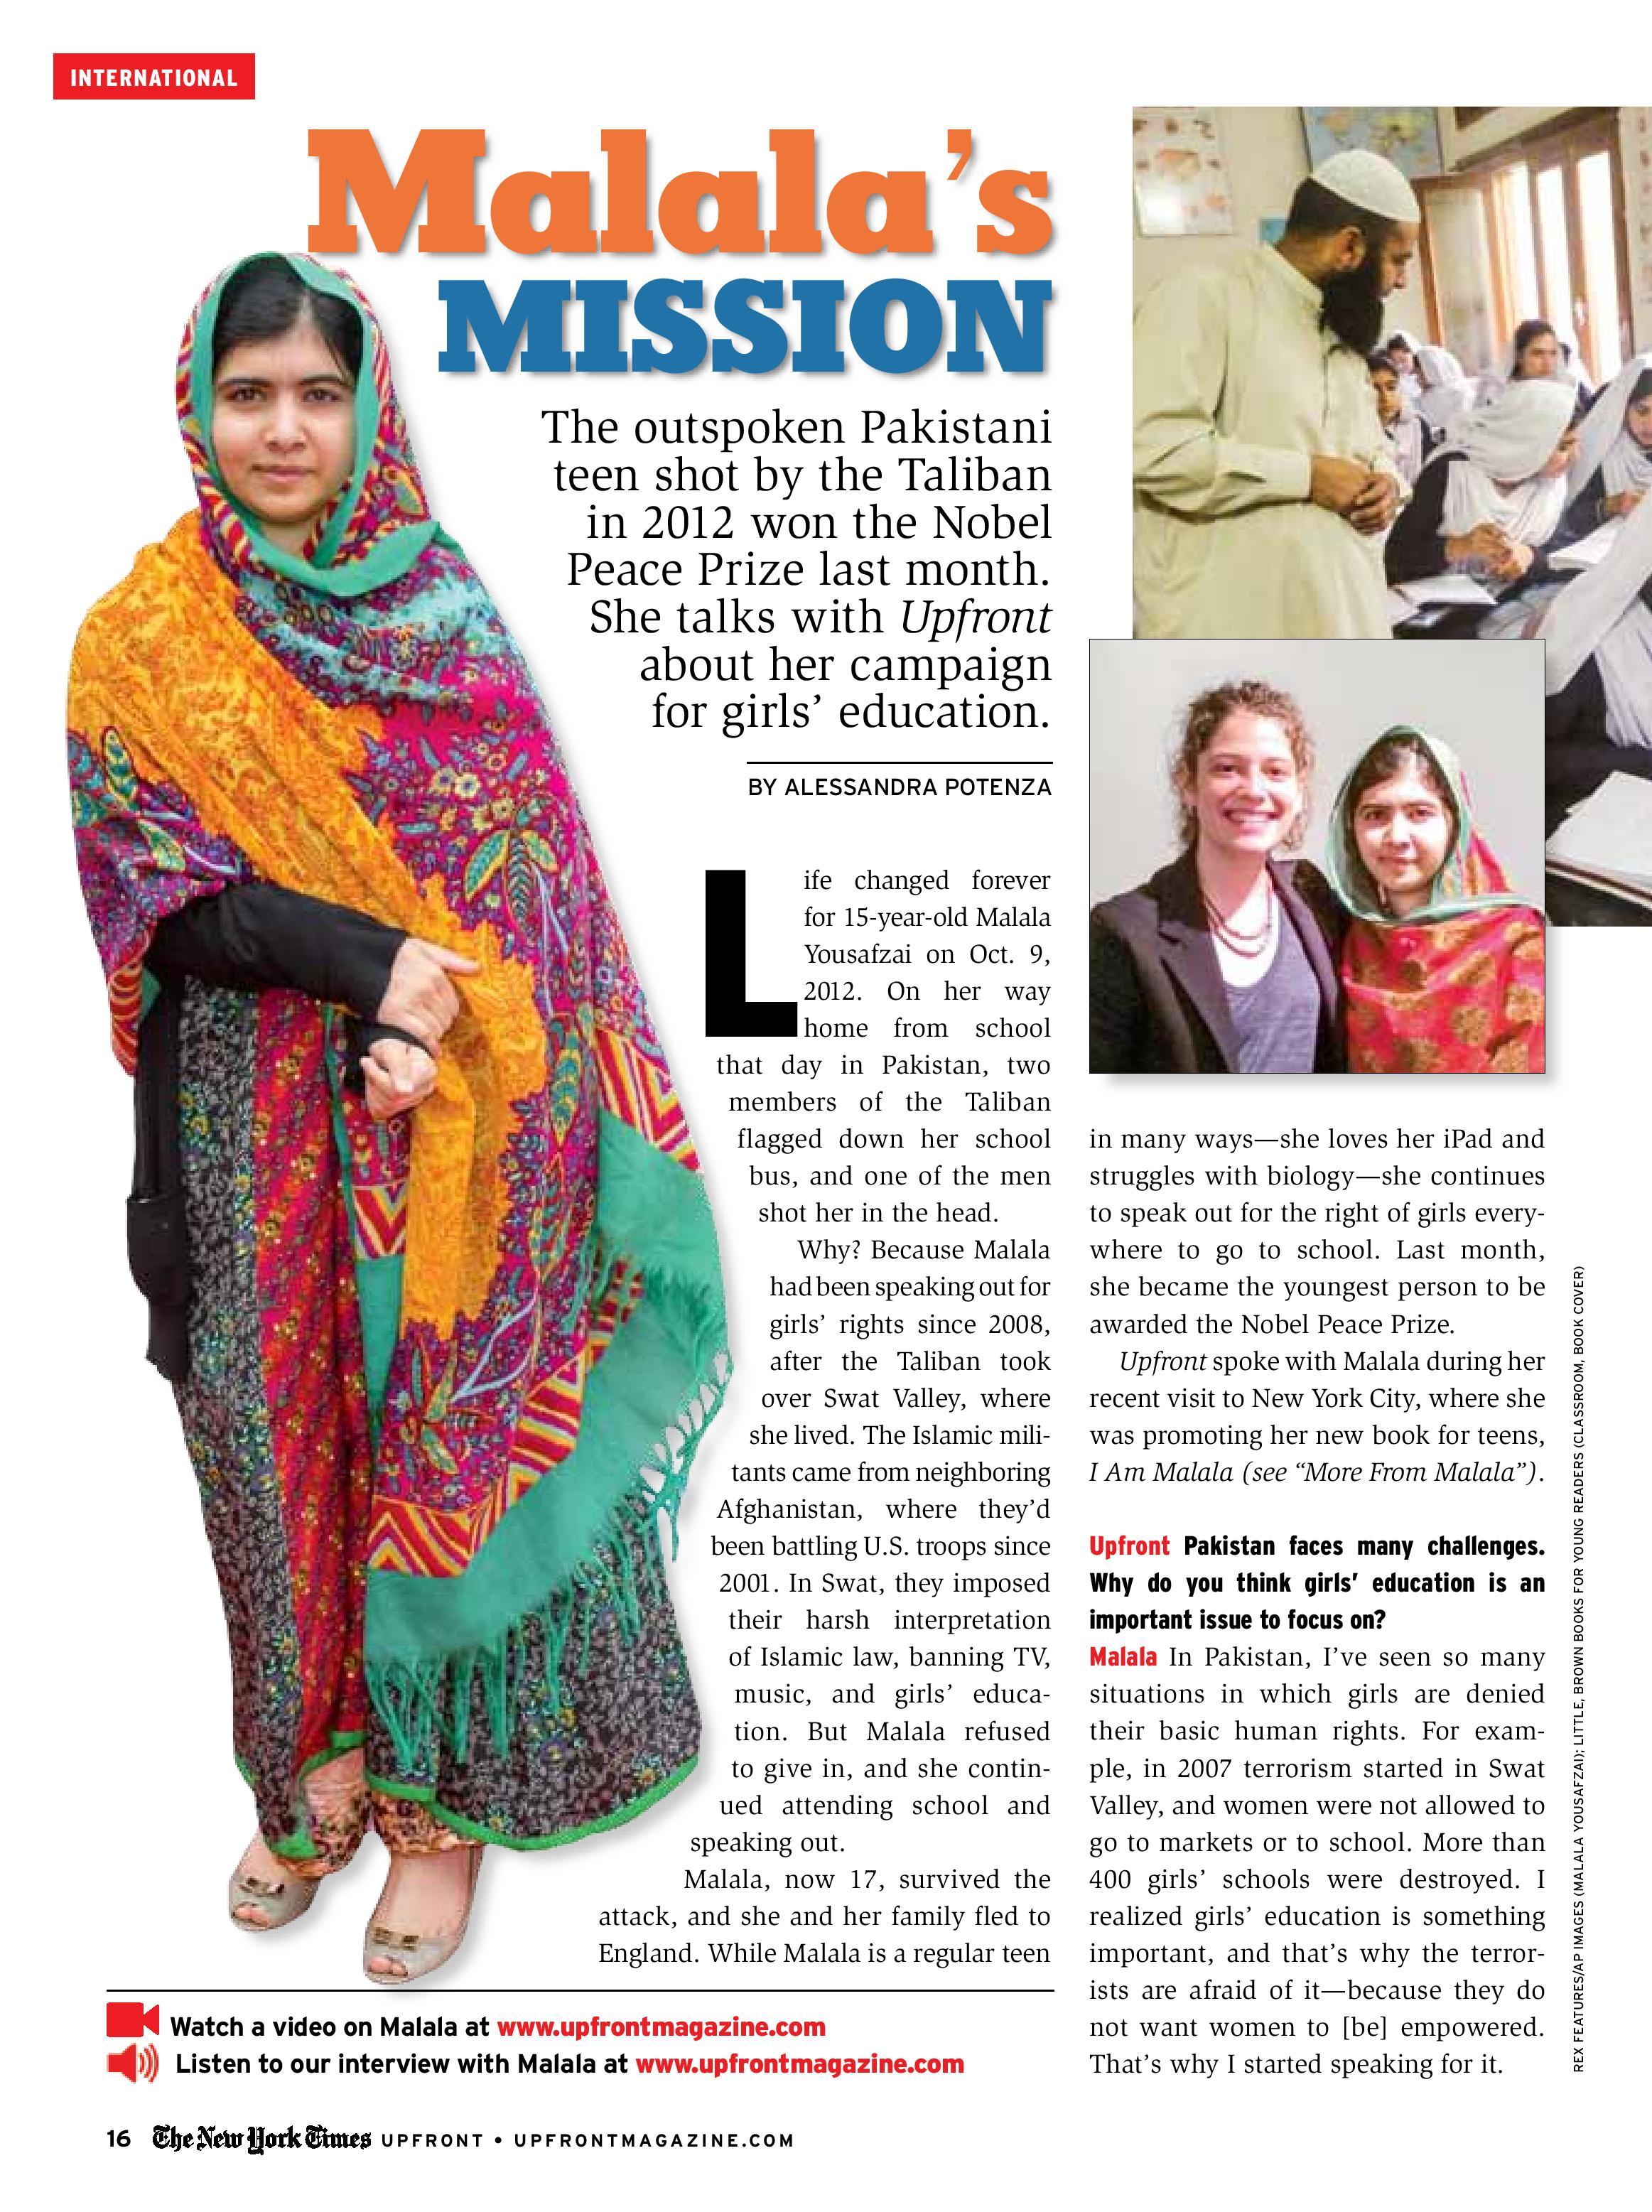 05-UPF-111714-Malala s mission-page-001.jpg